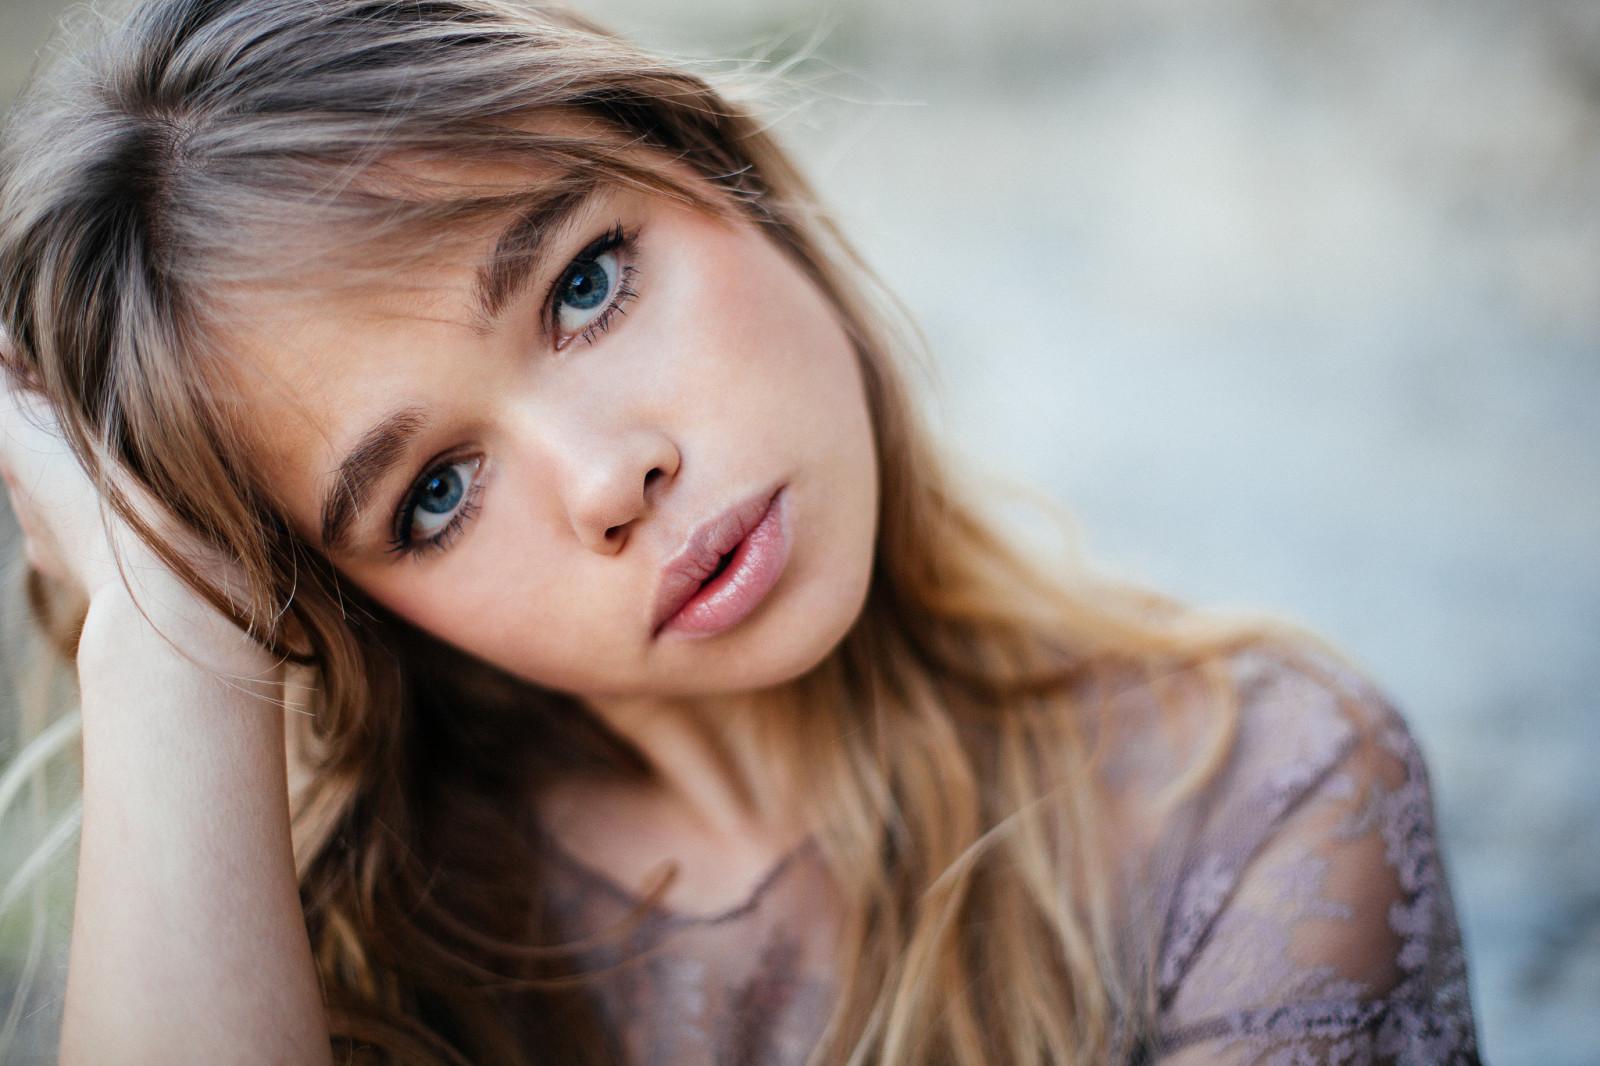 teen-blue-eyed-beauty-video-download